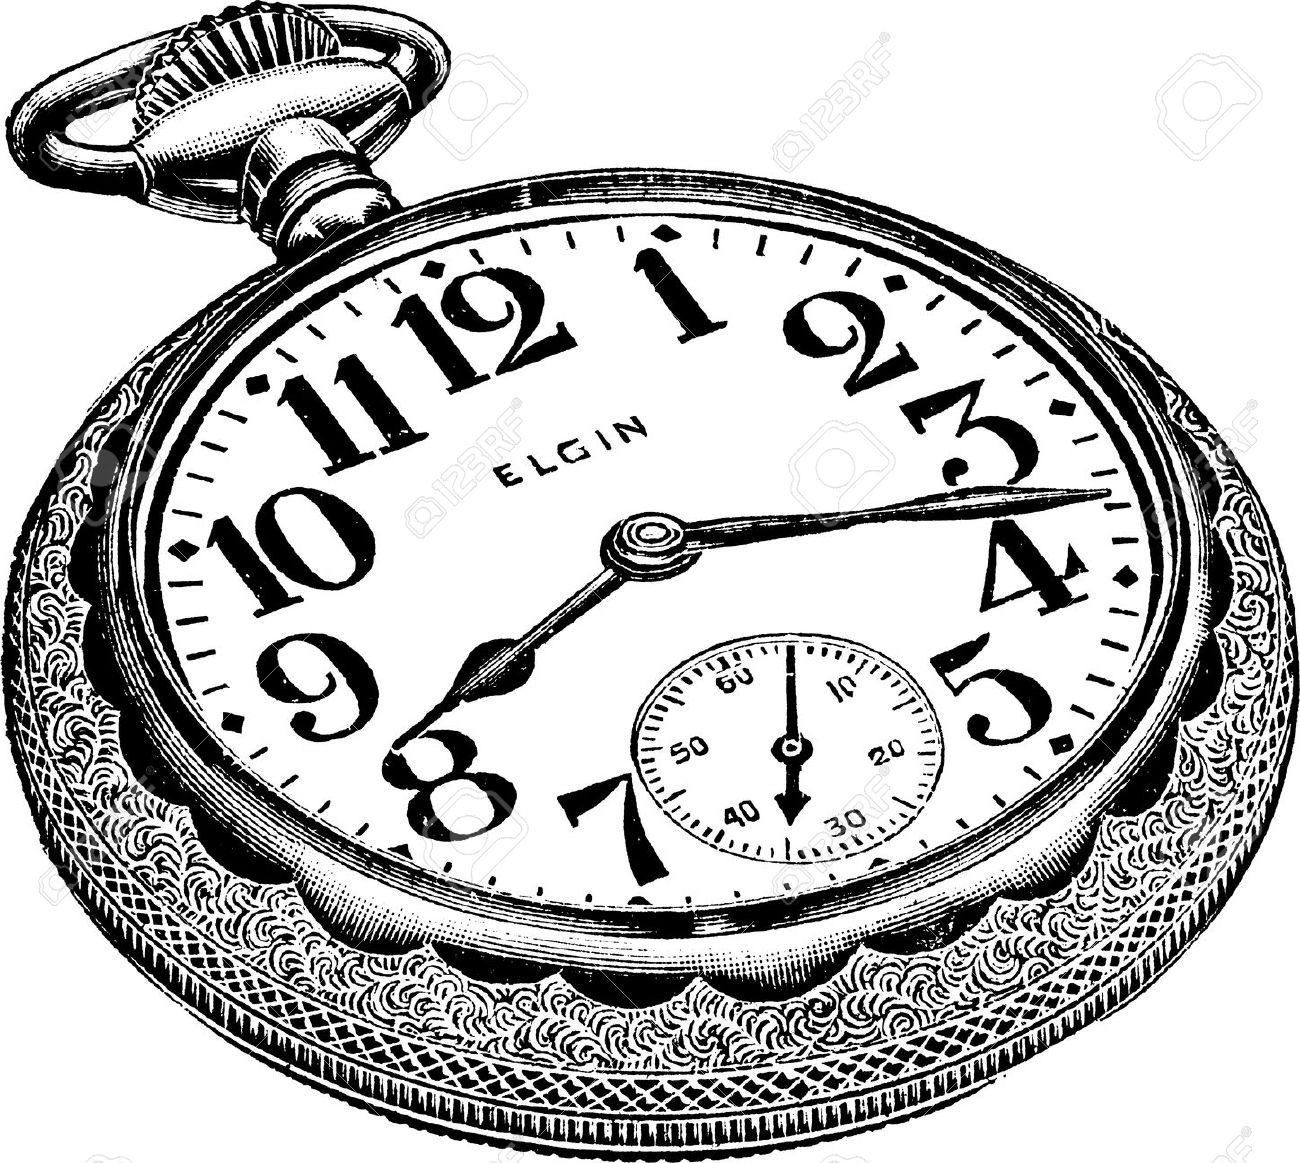 1300x1163 Pocket Watch Line Drawingnntique Engraved Illustration